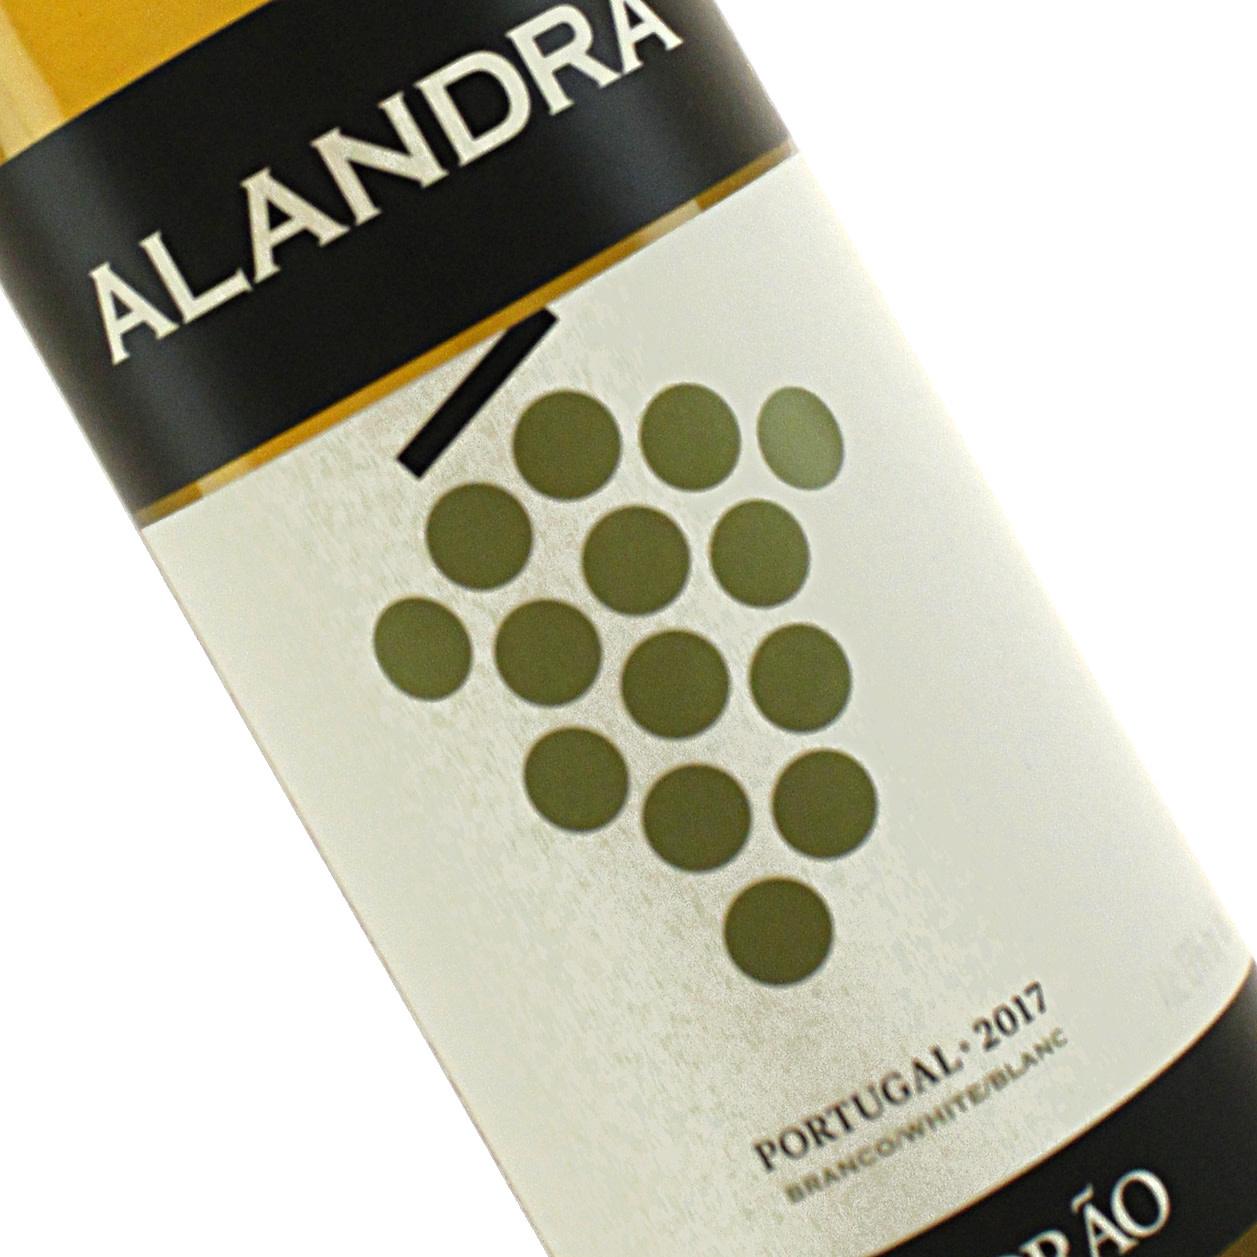 Esporao 2017 Alandra White Wine, Alentejo, Portugal